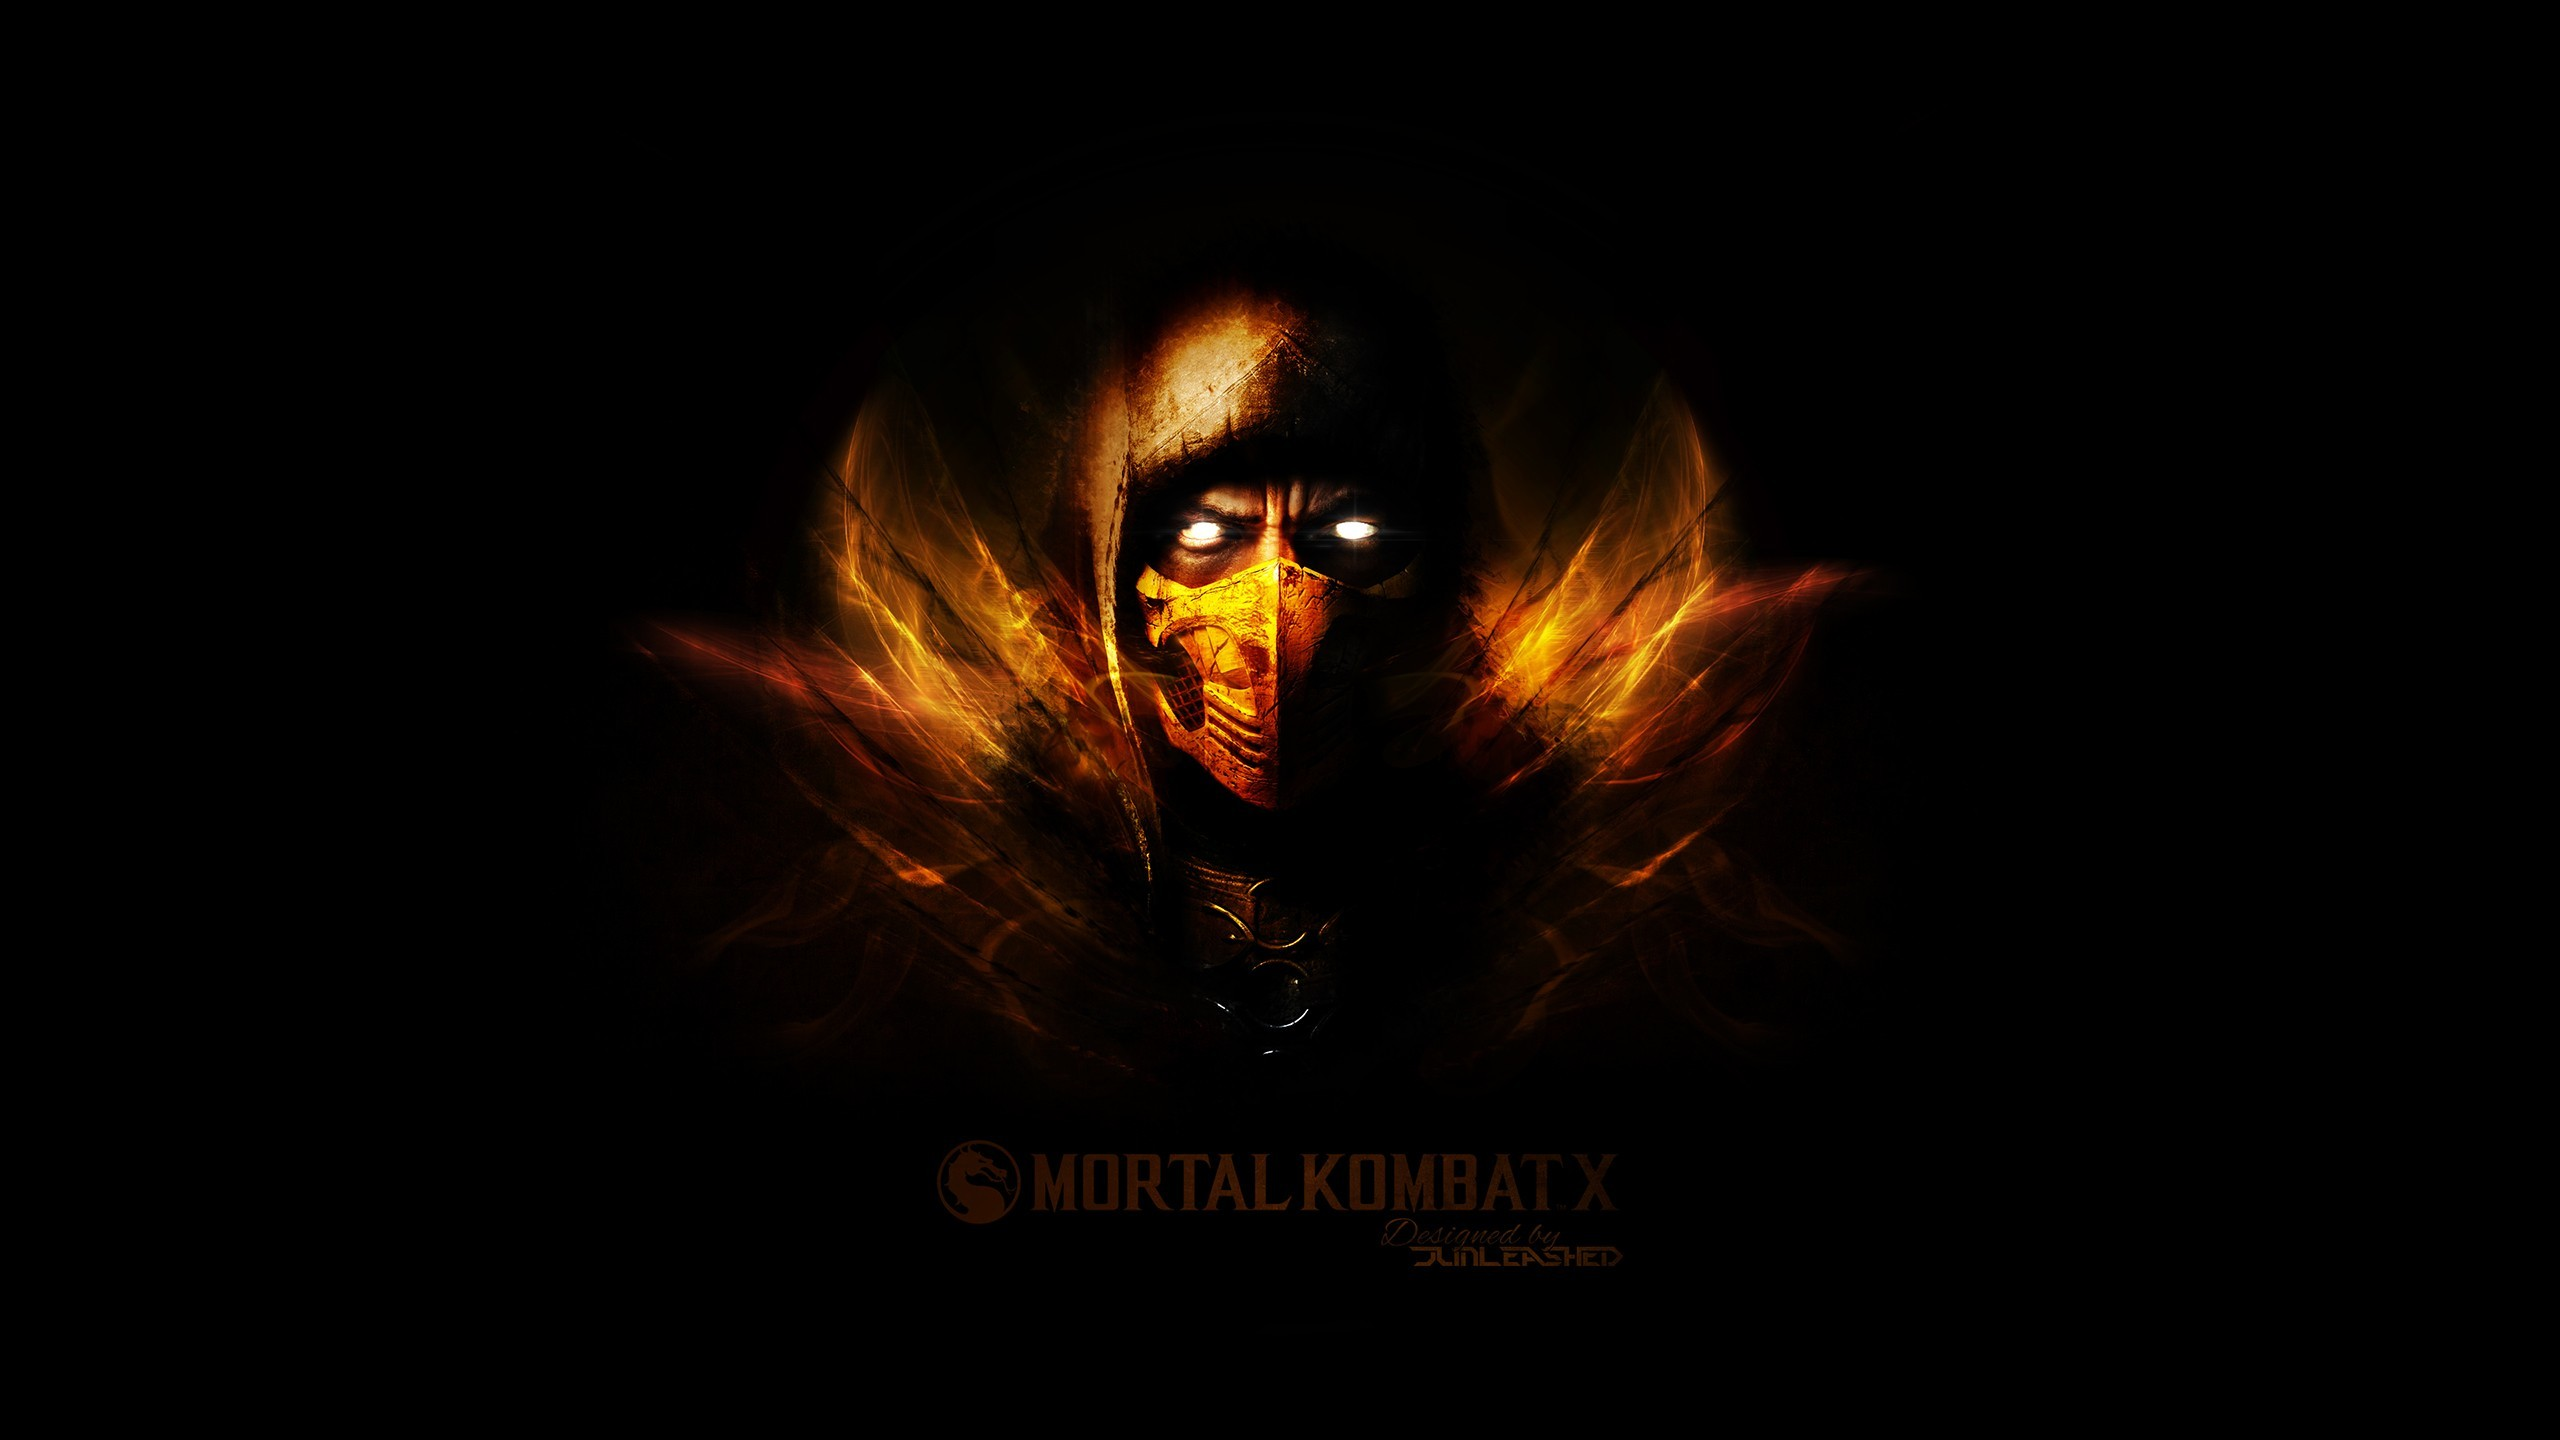 Mortal Kombat Sub-Zero artwork HD Wallpaper –  https://www.hdwallpaperuniverse.com/mortal-kombat-sub-zero-artwork-hd- wallpaper/   Pinterest   Mortal kombat, …